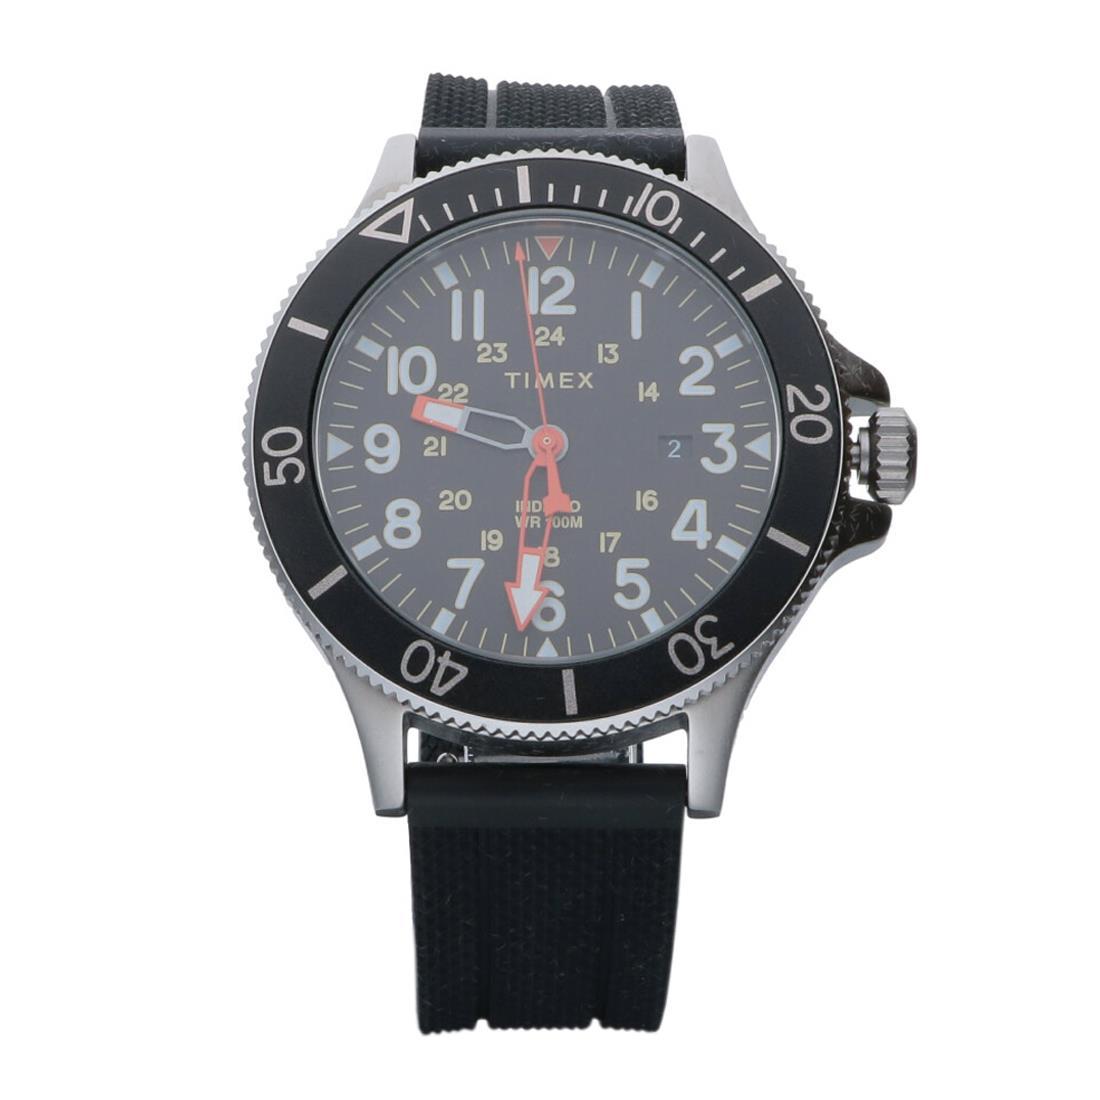 Orologio uomo cassa 43 mm - TIMEX